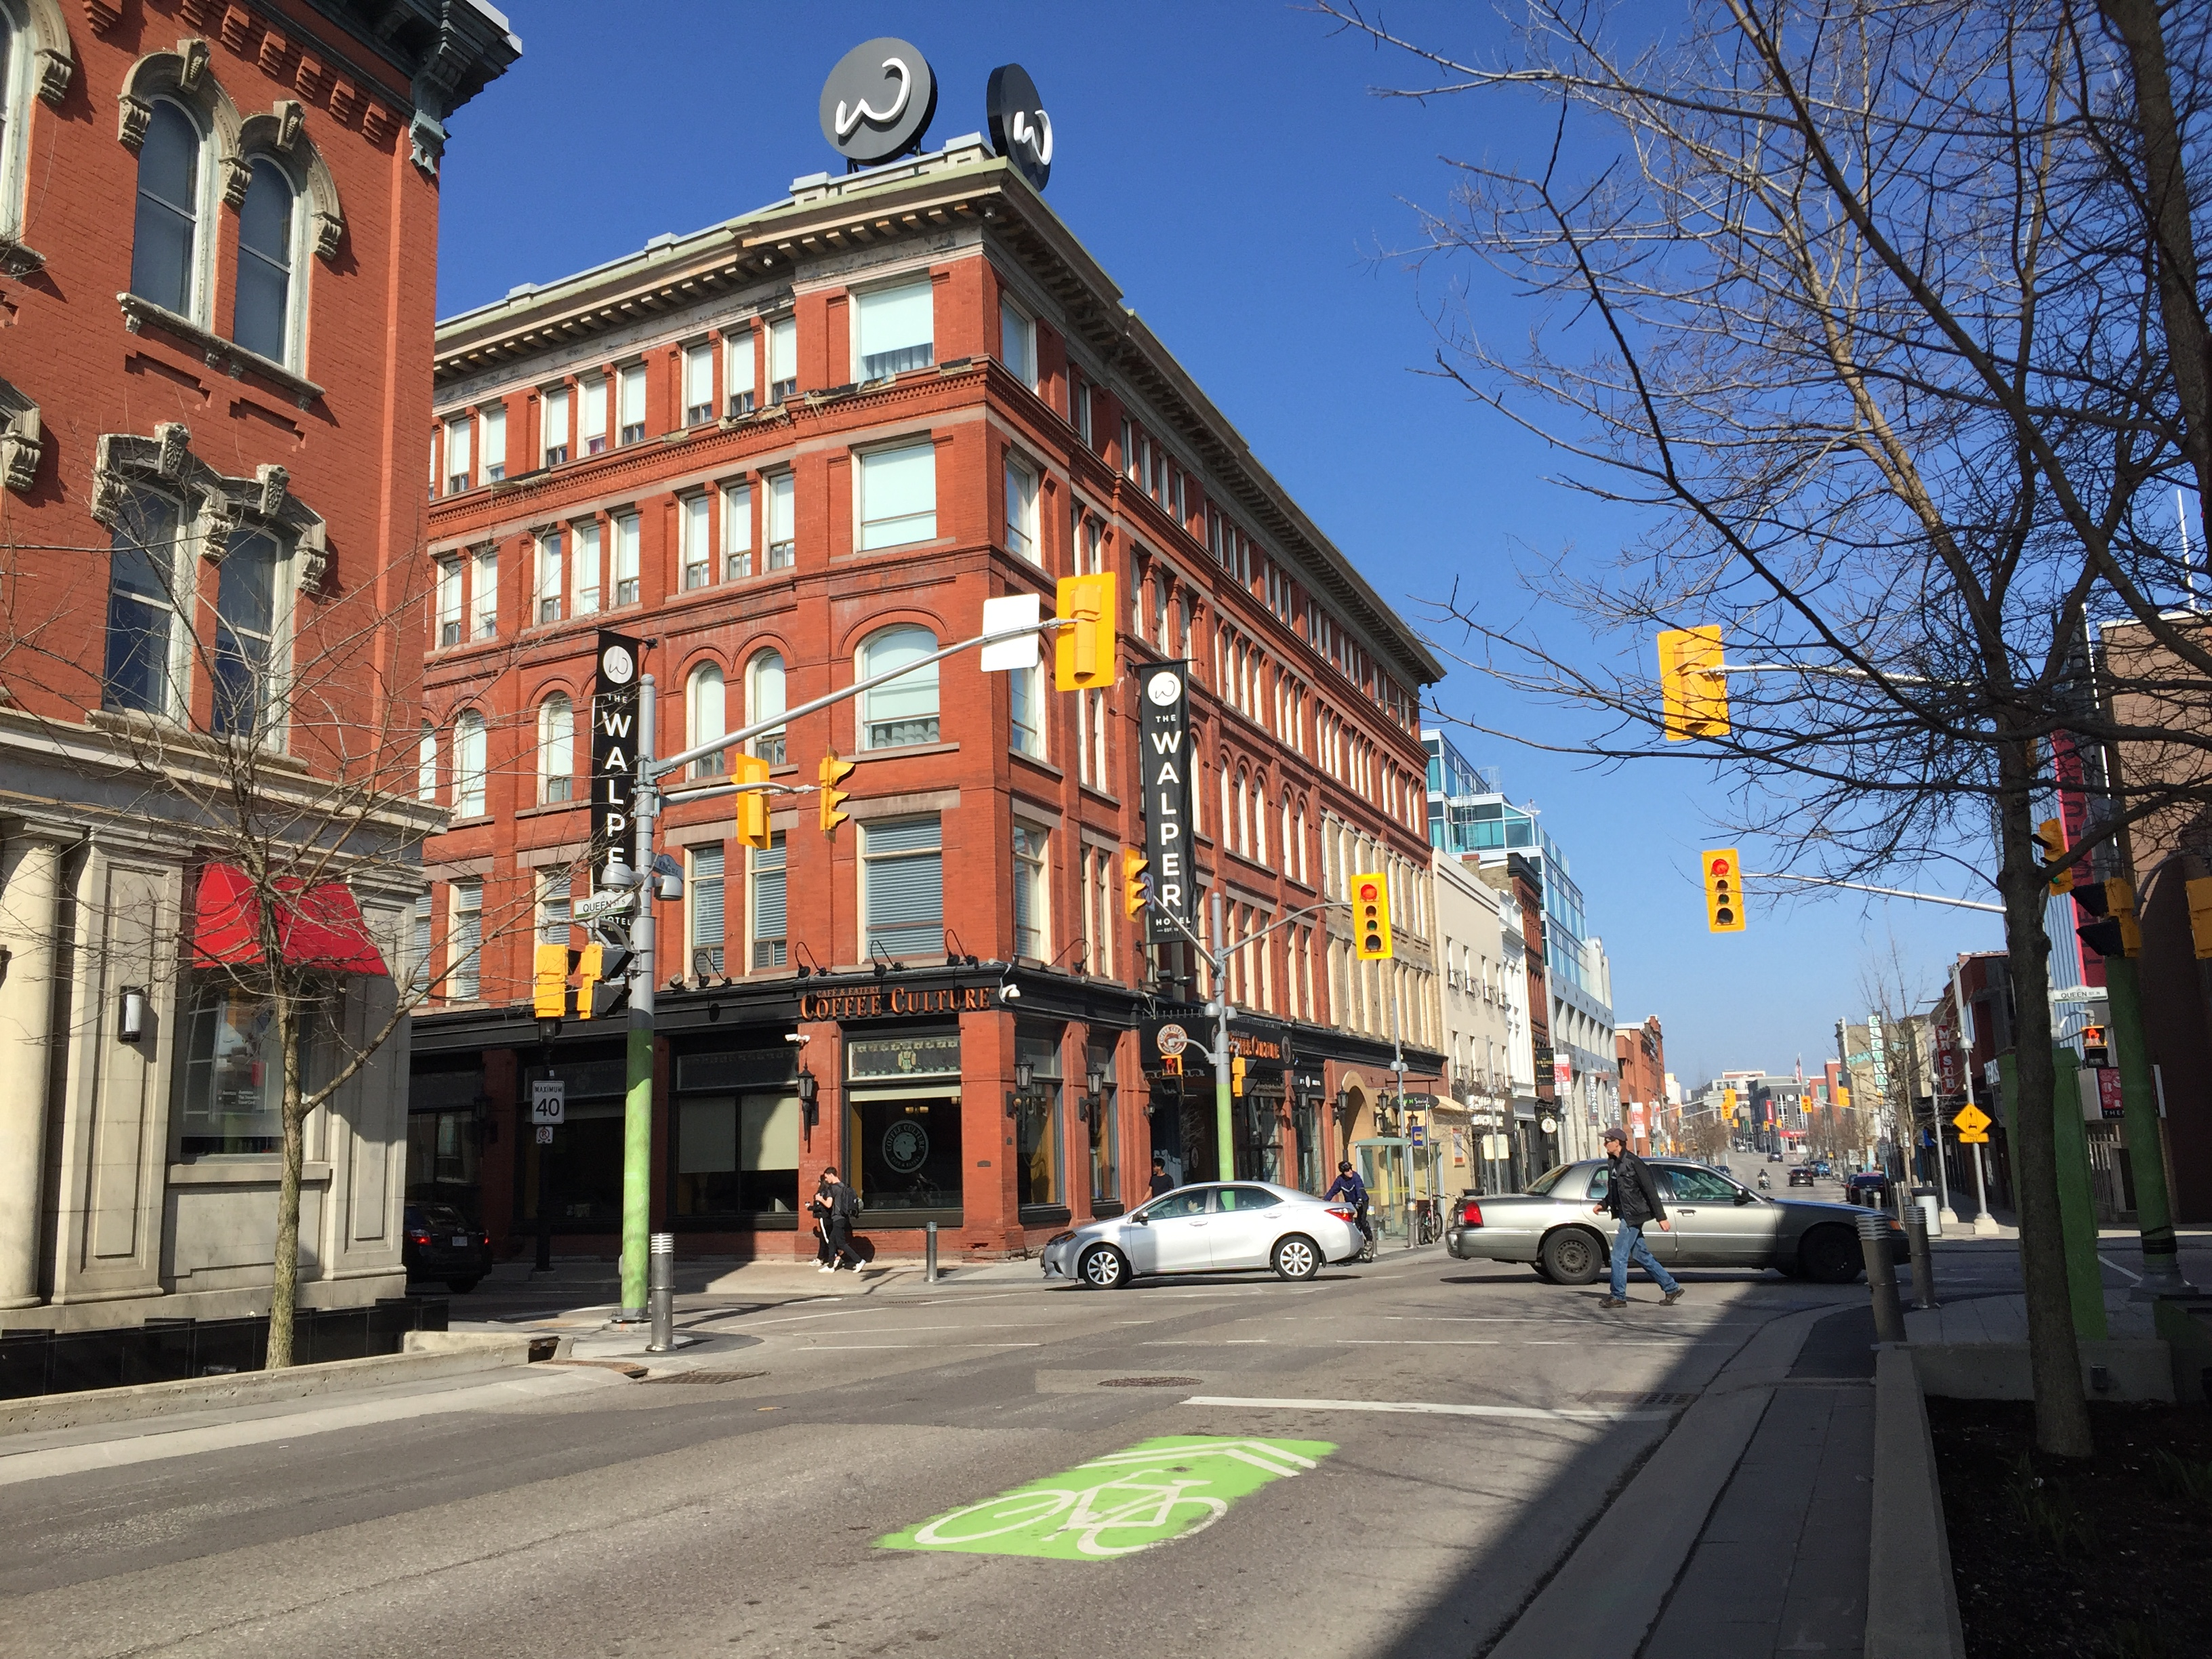 globalnews.ca - Kevin Nielsen - Christmas movie being filmed in downtown Kitchener